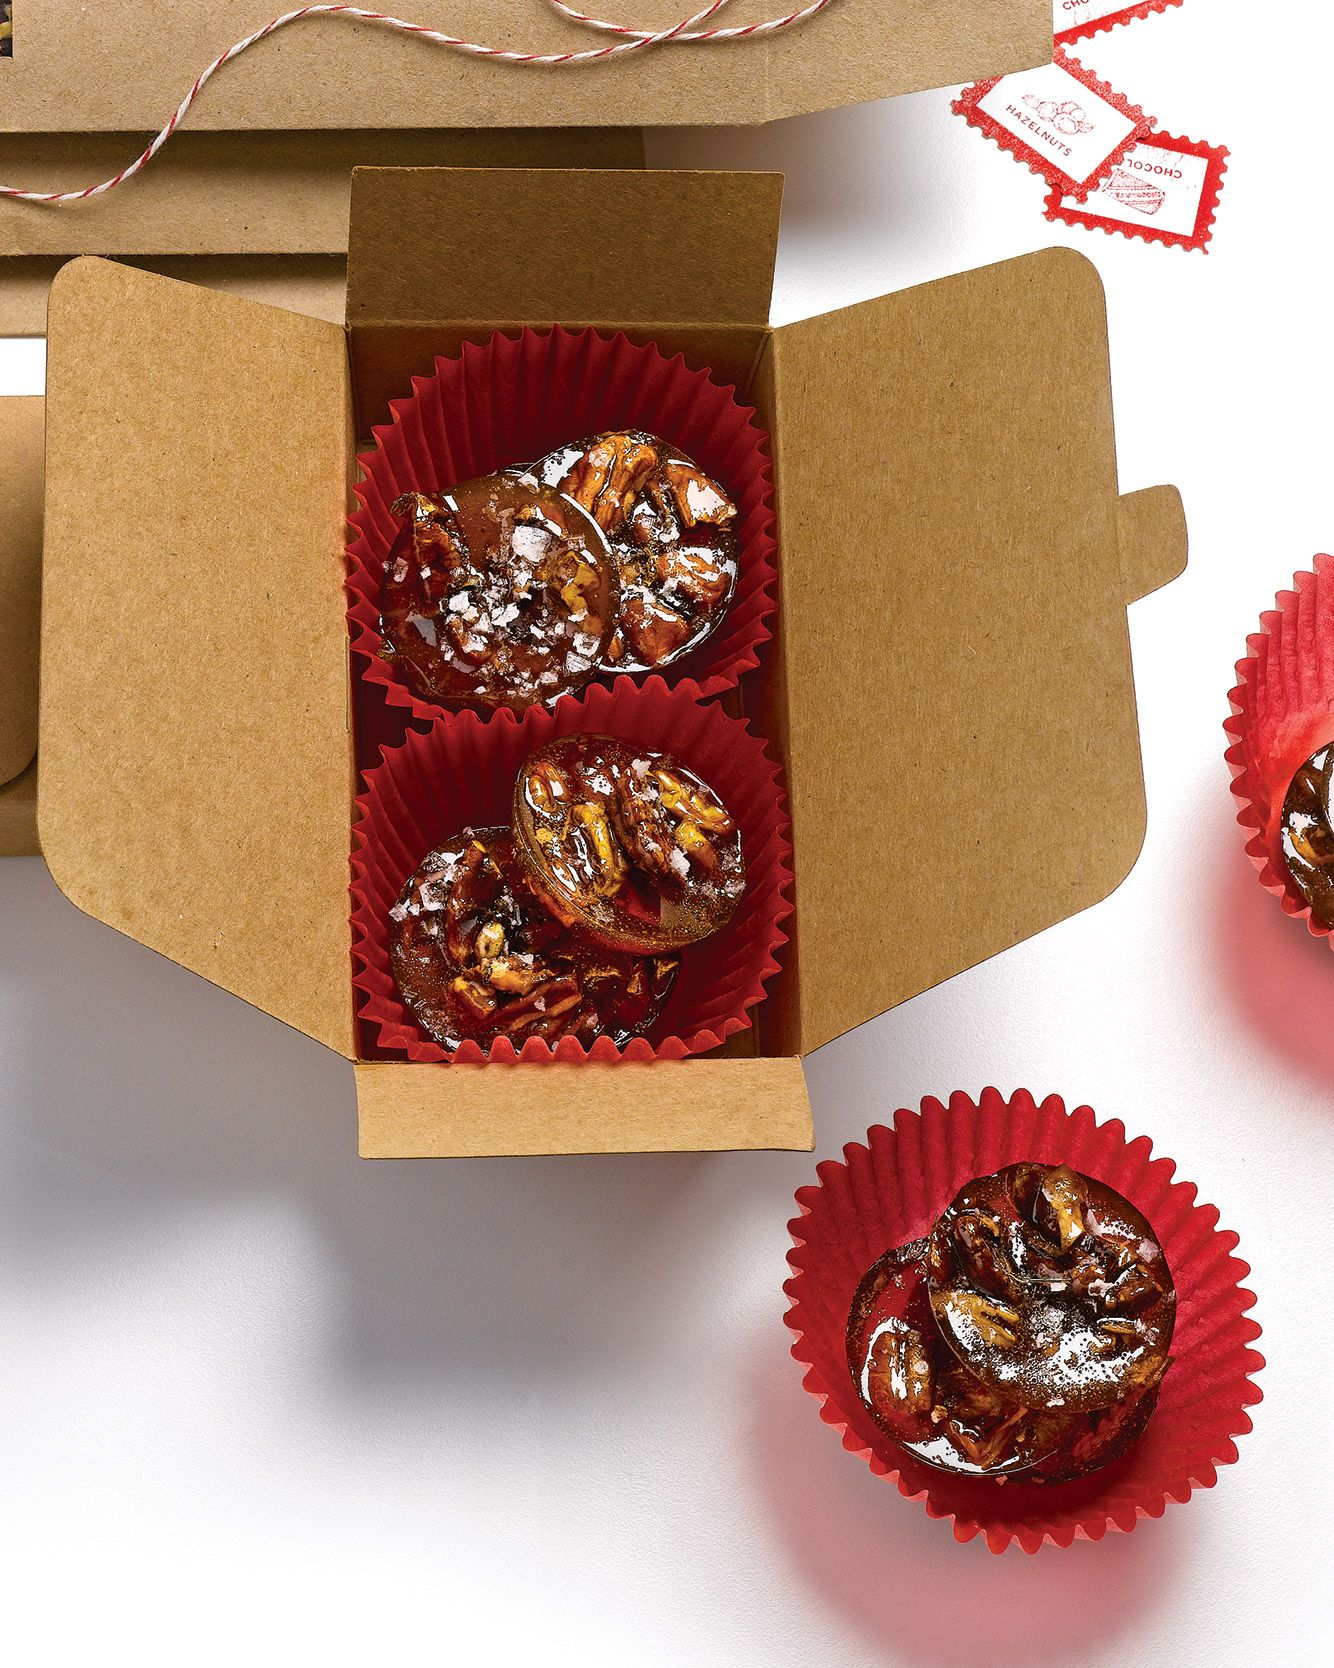 Happy Birthday Caitlin Mini Heart Tin Gift Present For Caitlin WIth Chocolates